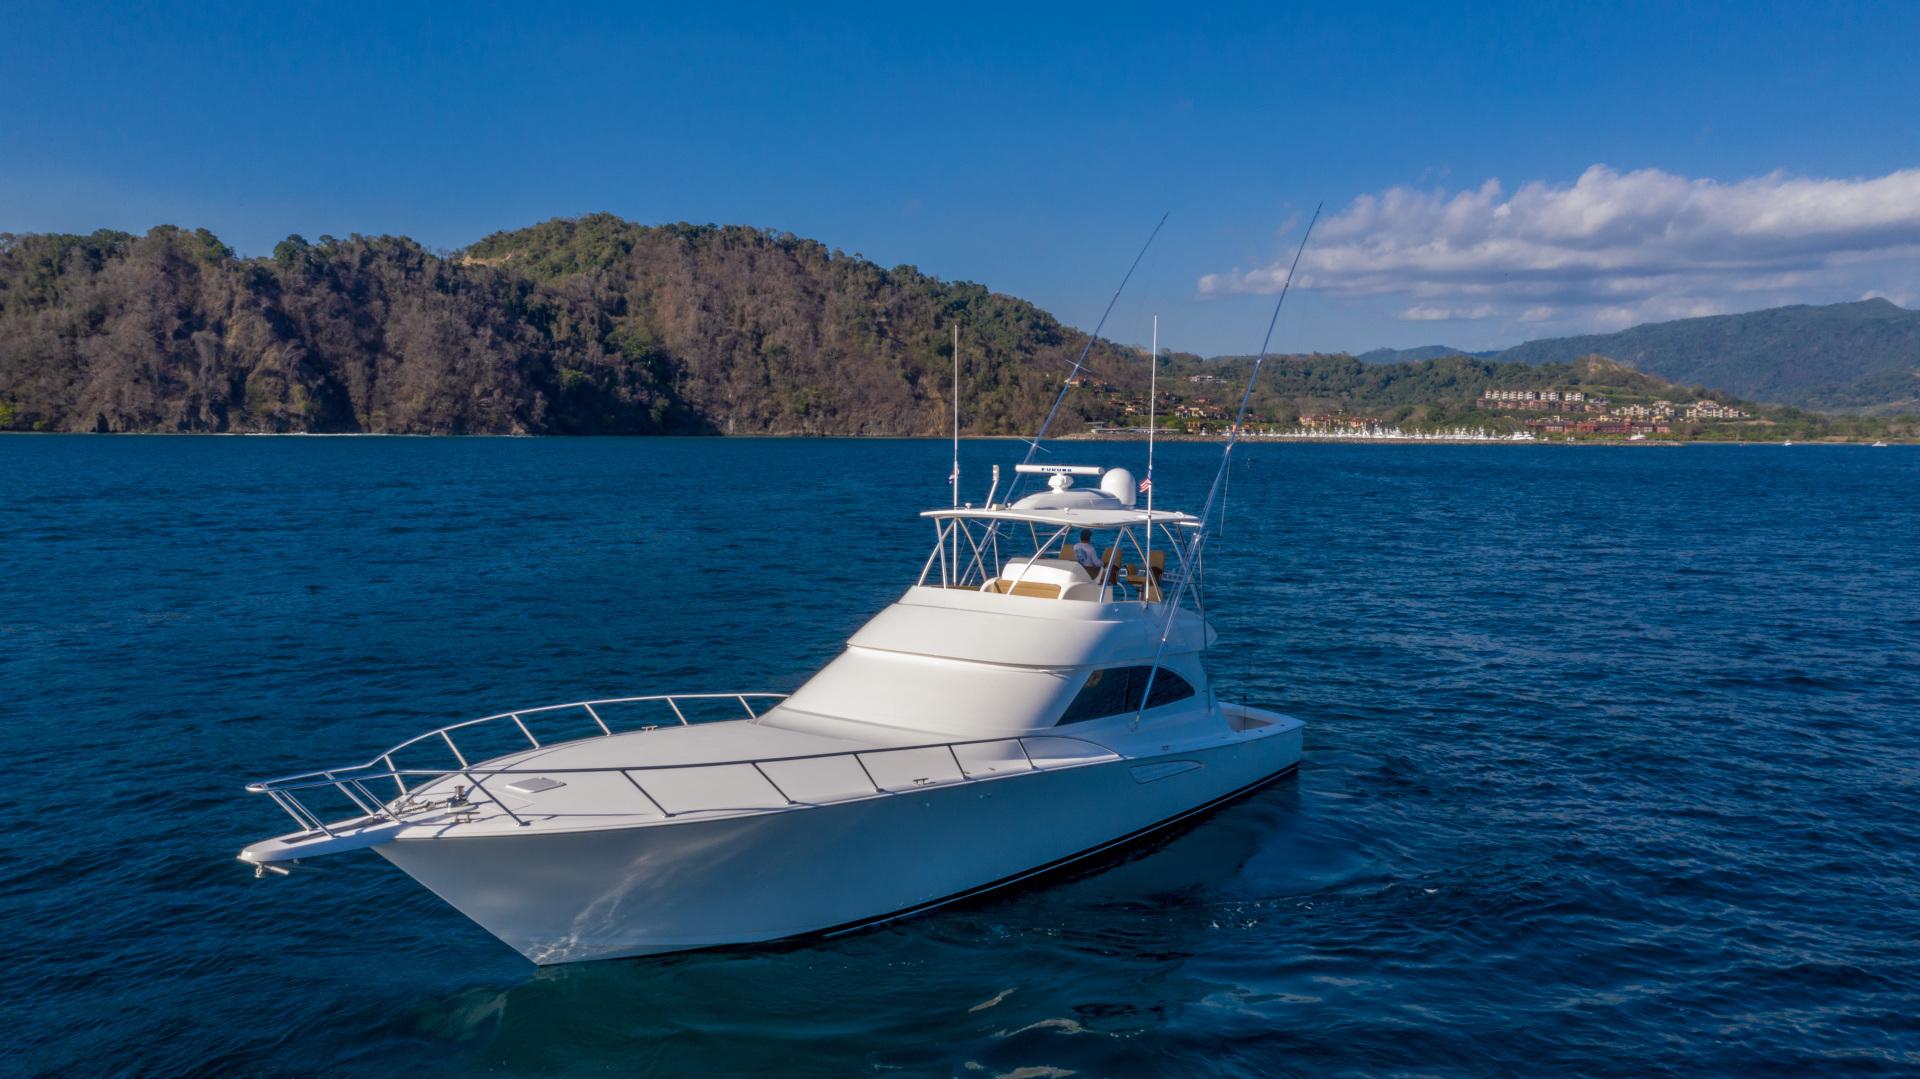 Viking-62 Convertible 2014-Mixer Playa Herradura, Los Suenos,-Costa Rica-2014 Viking 62 Convertible  Port Profile-1356269 | Thumbnail